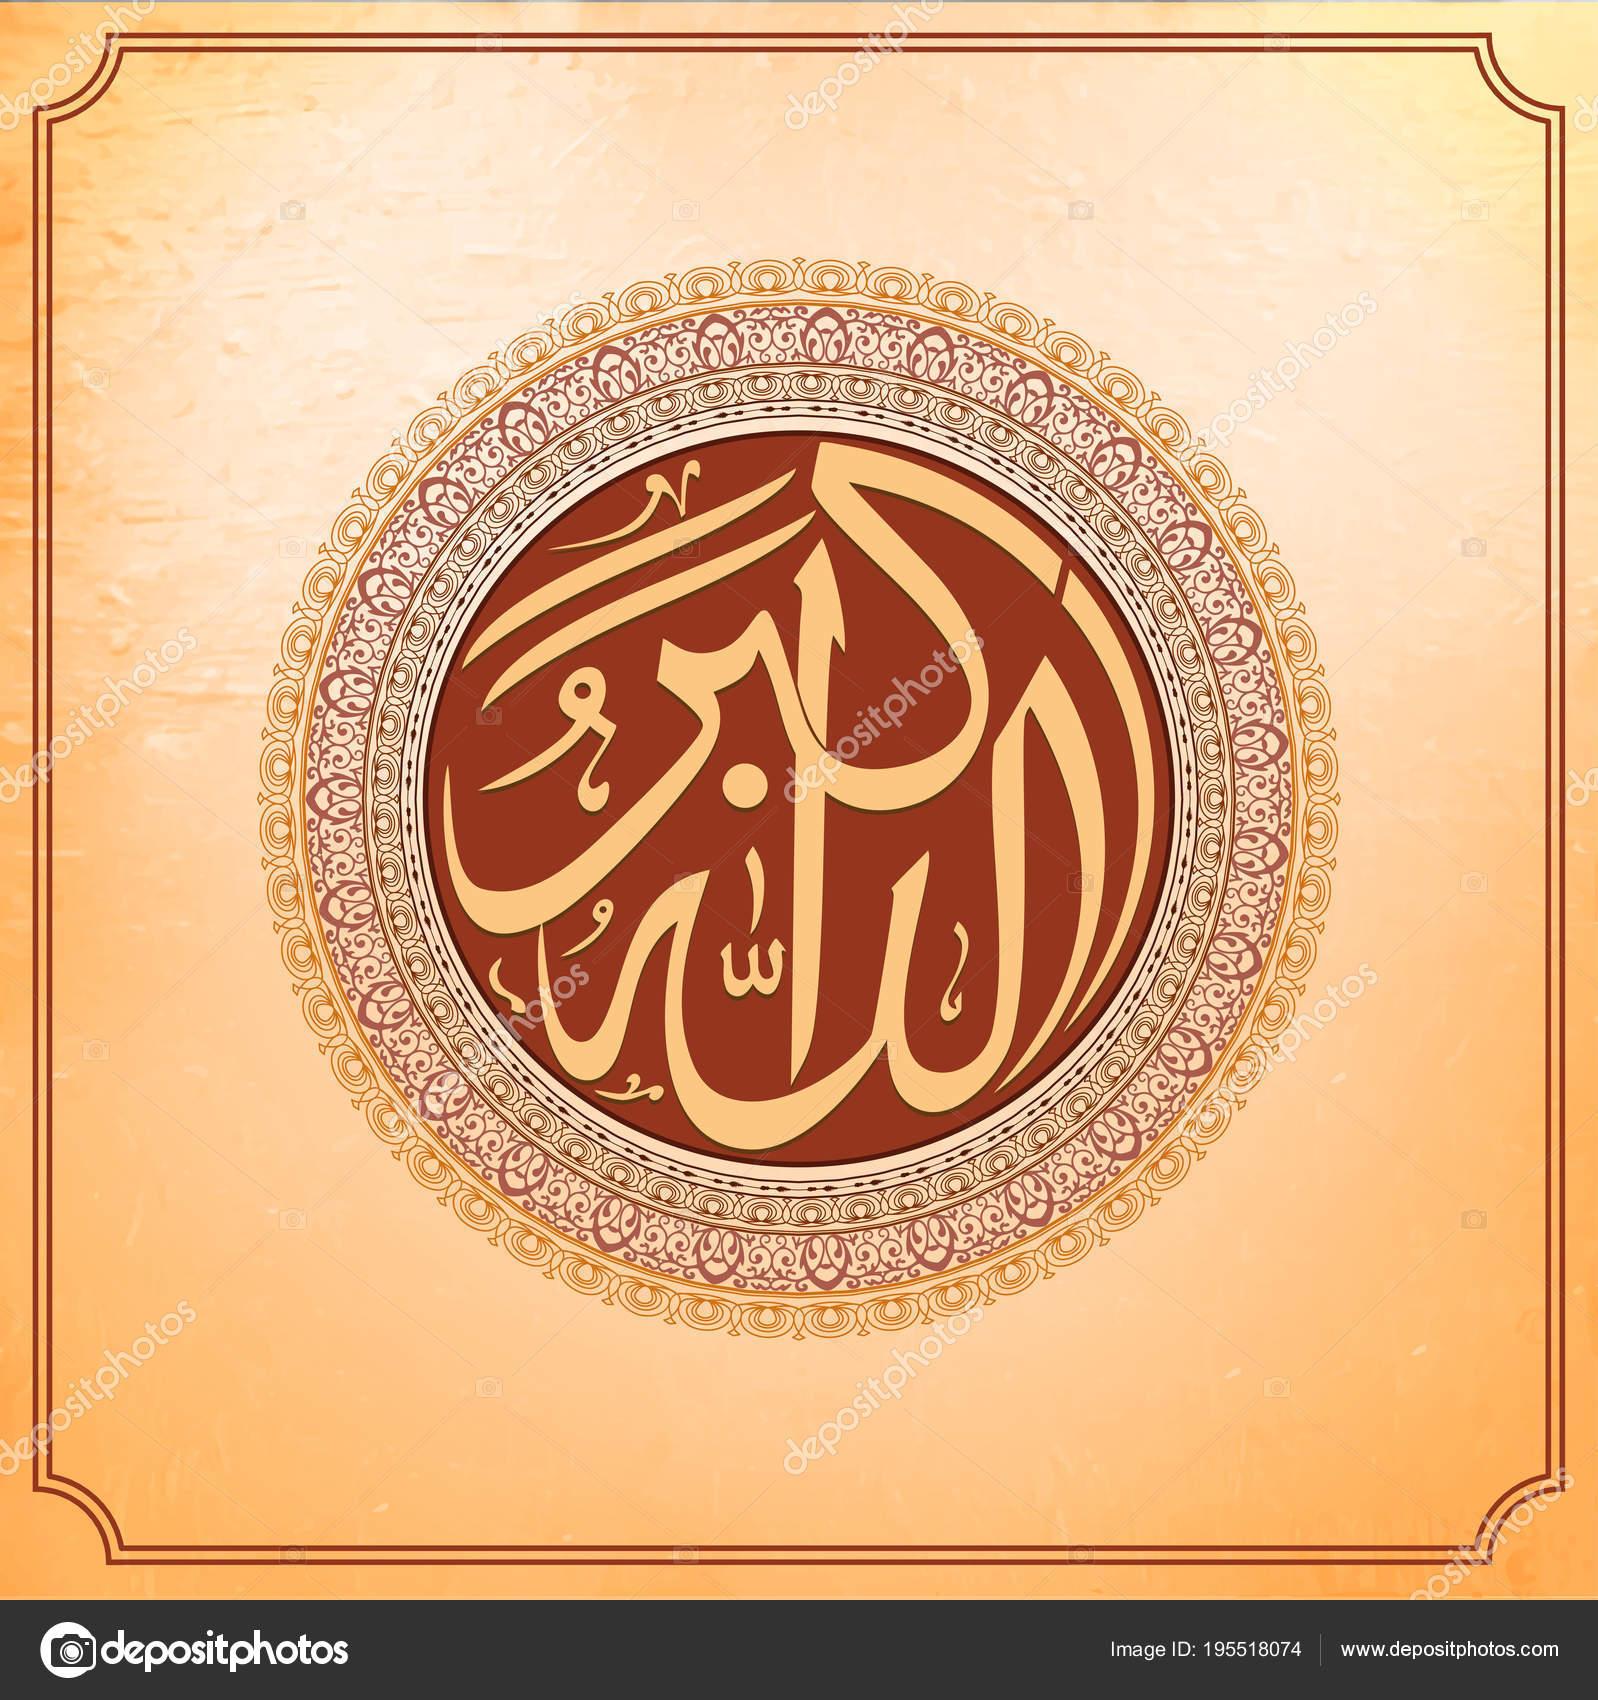 Images: allah hu akbar   Arabic Islamic calligraphy of Dua